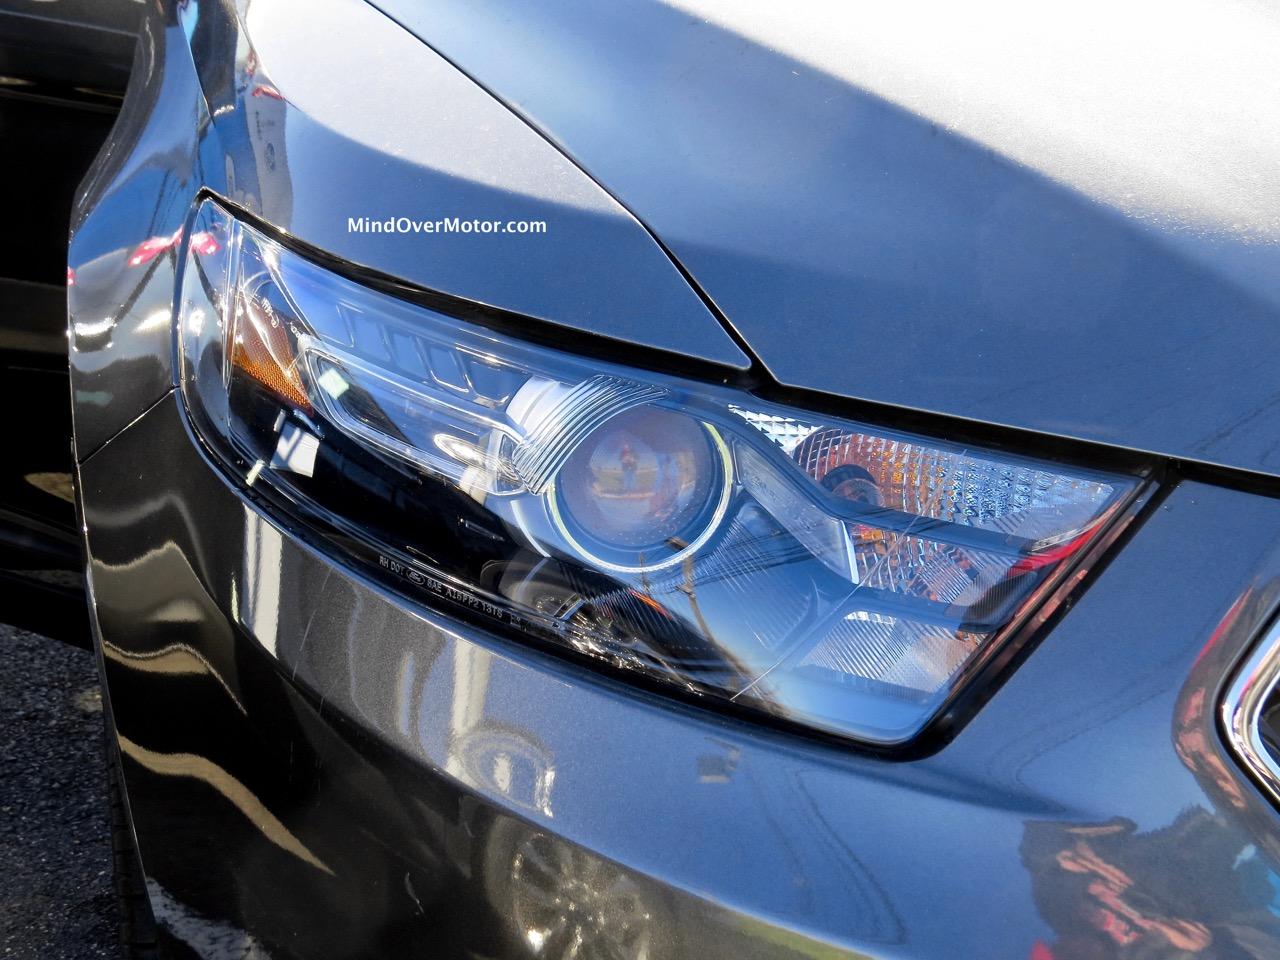 2015 Ford Taurus SHO Headlight